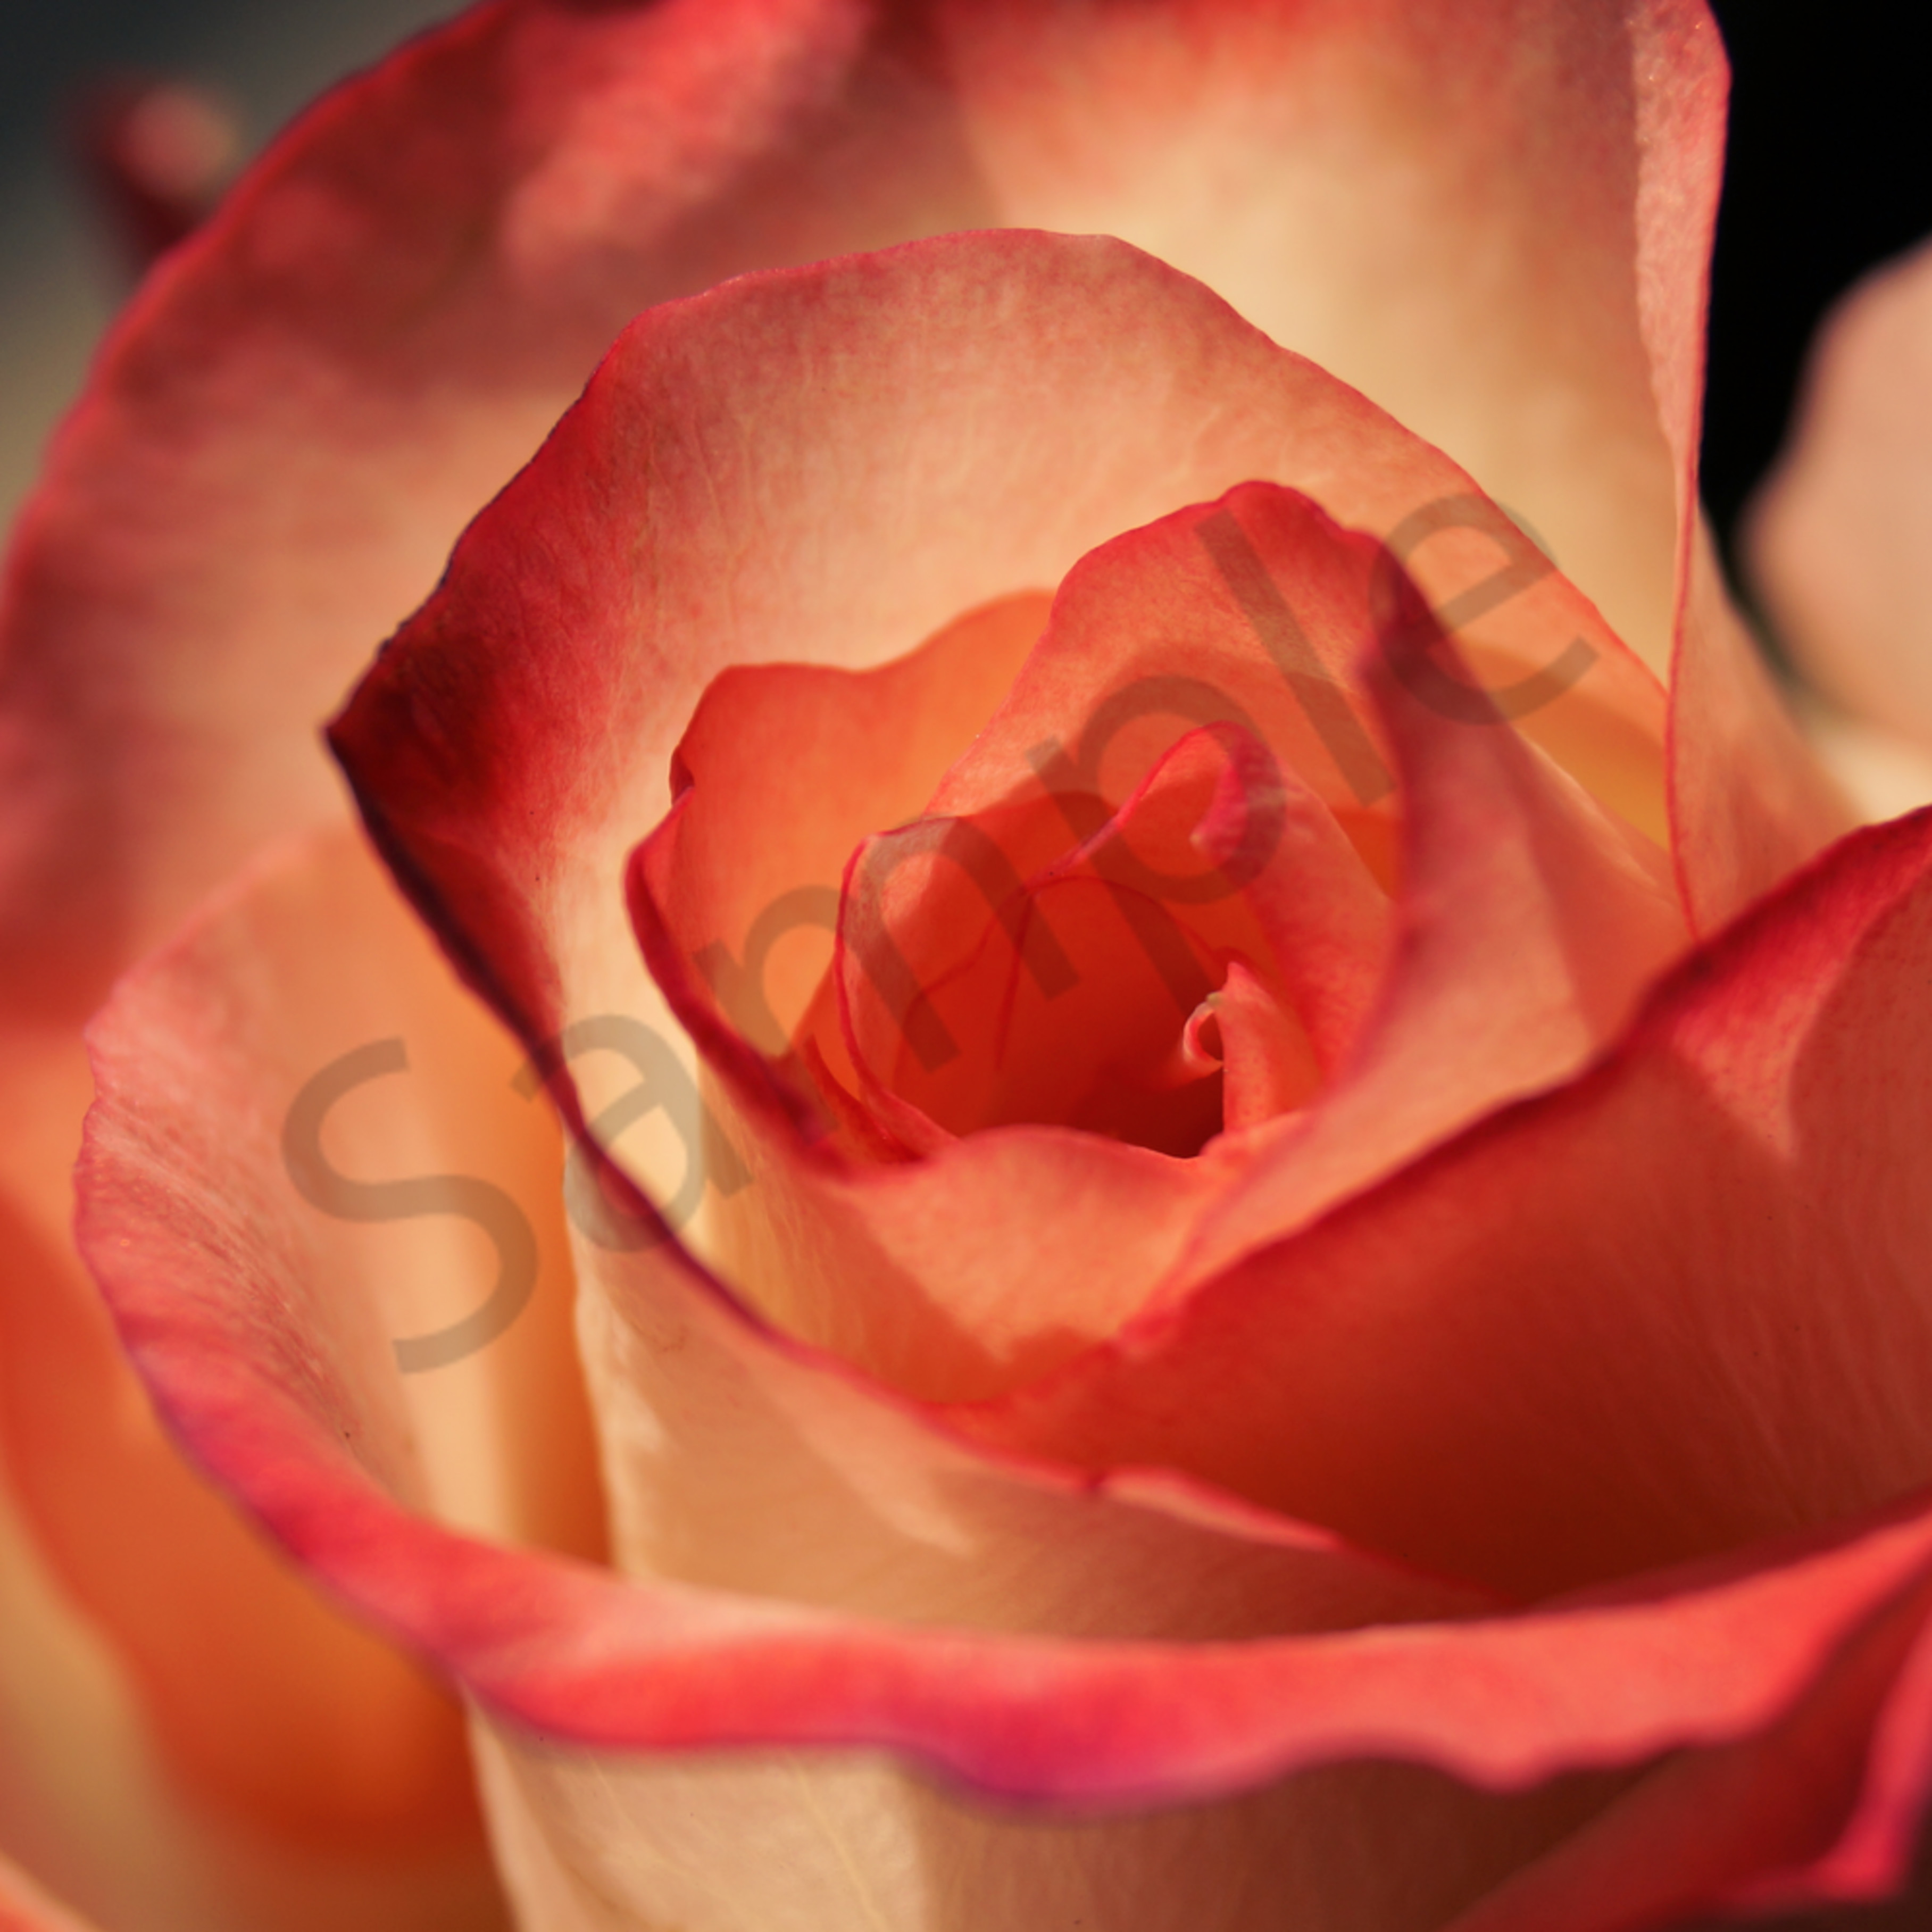 Soft rose bbahpd